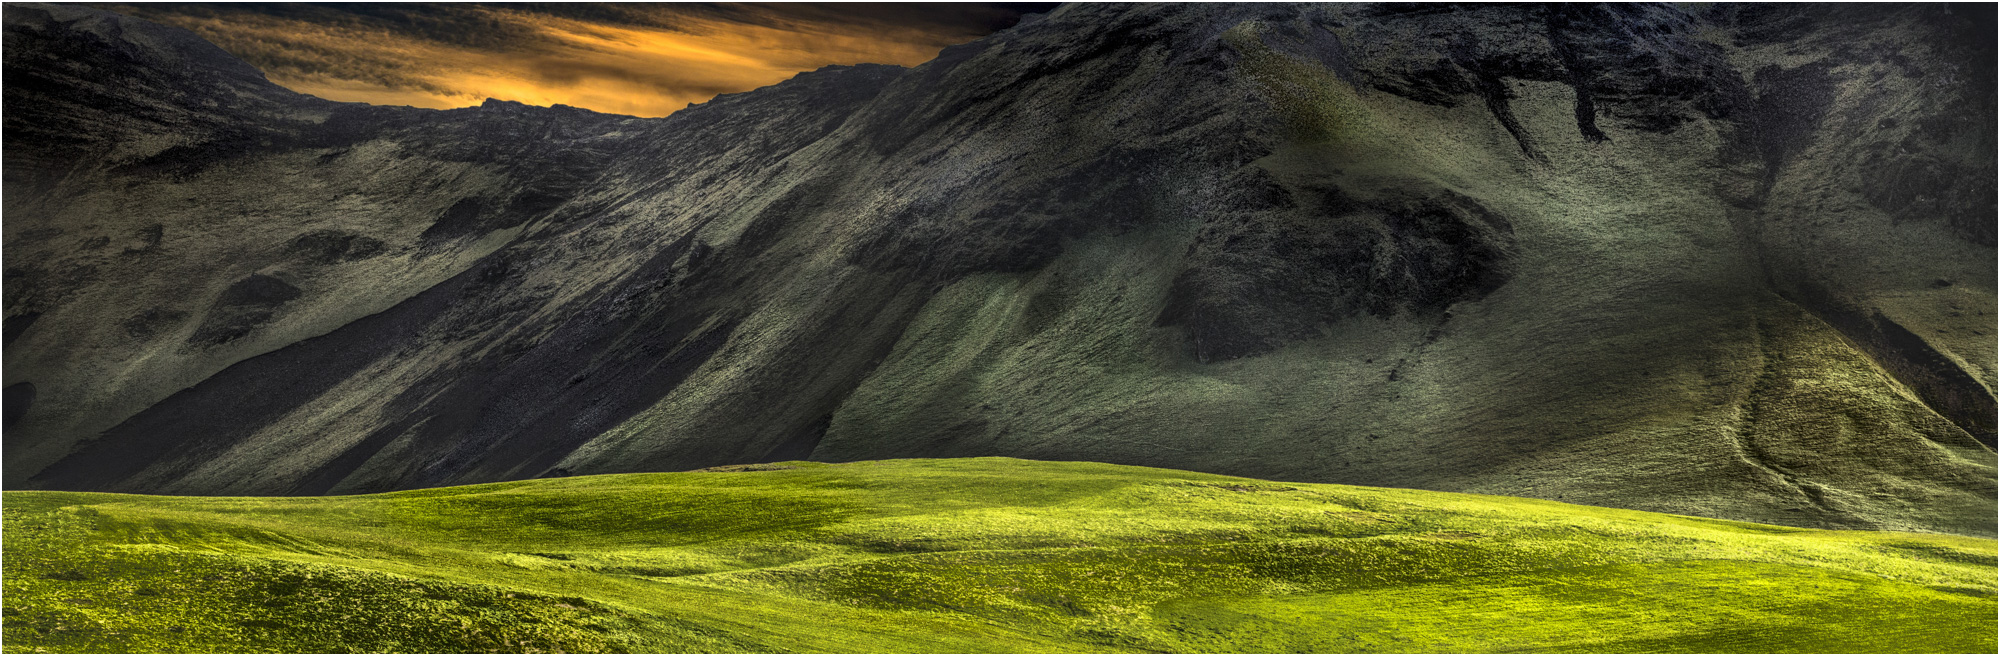 024 Iceland_.JPG